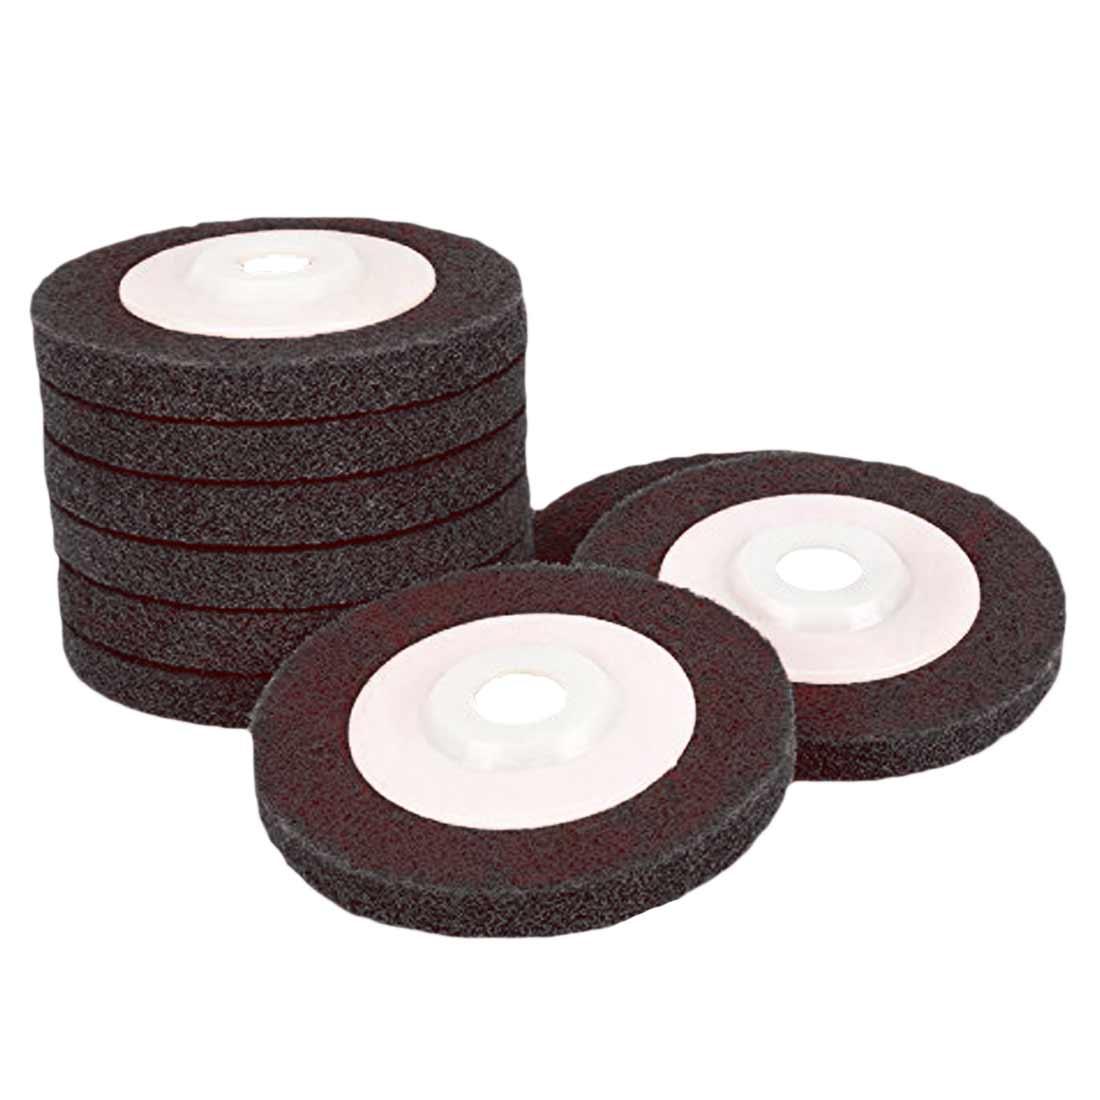 1Pc Nylon Fiber Polishing Wheel 100*12*16mm Grinding Machine Polishing Wheel Abrasive Tools